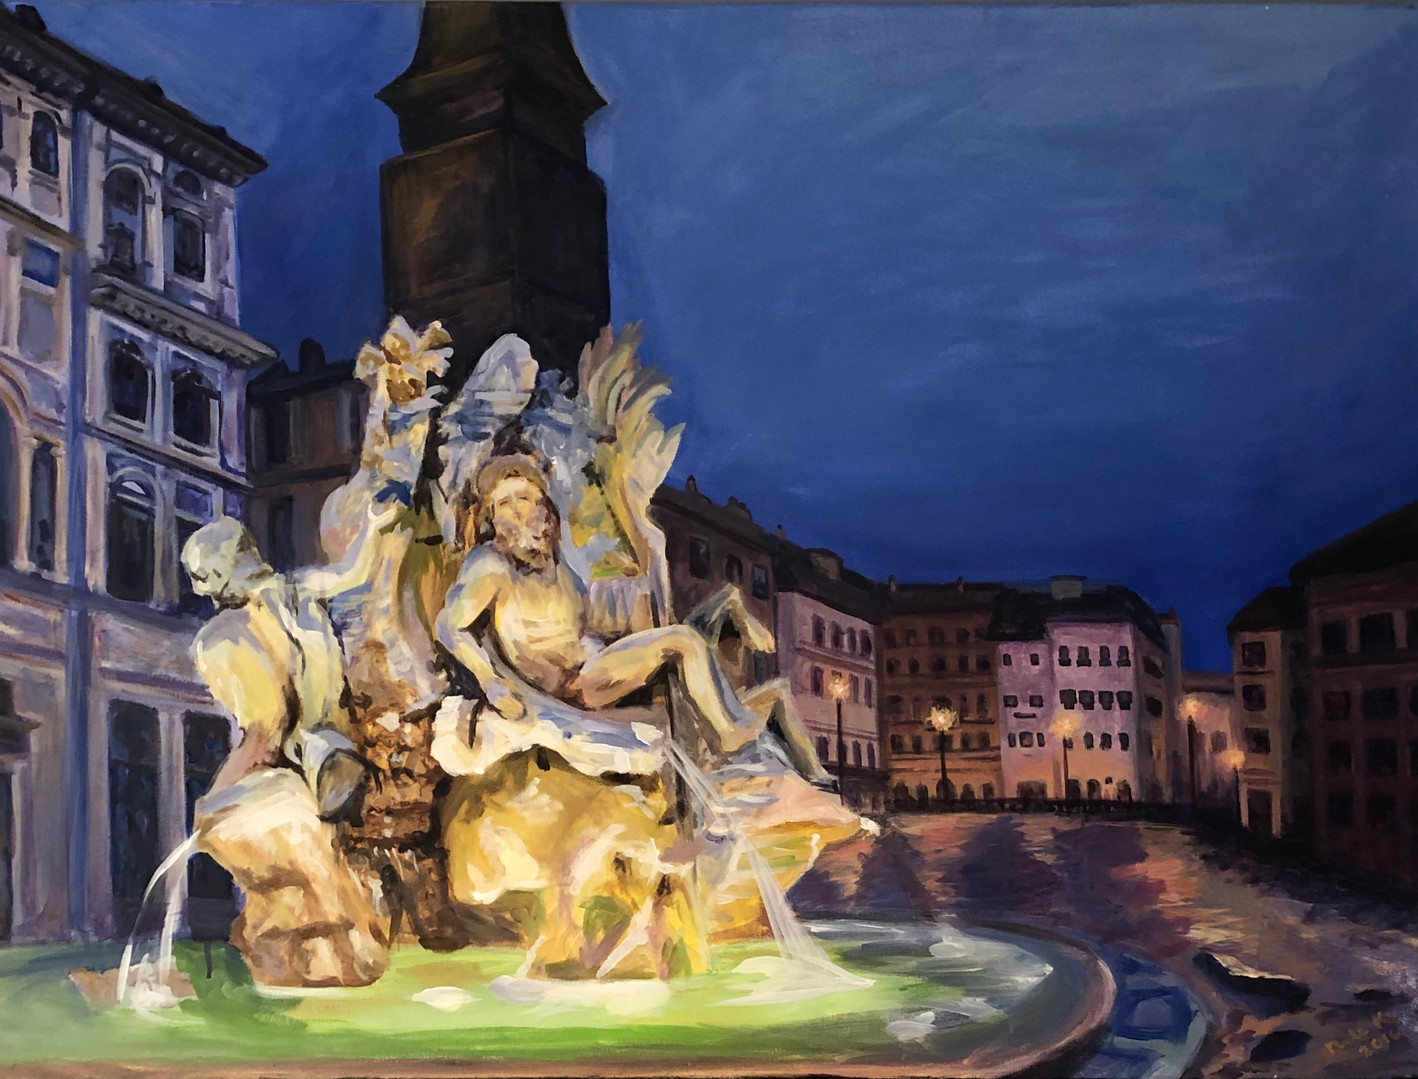 Four Rivers' Fountain